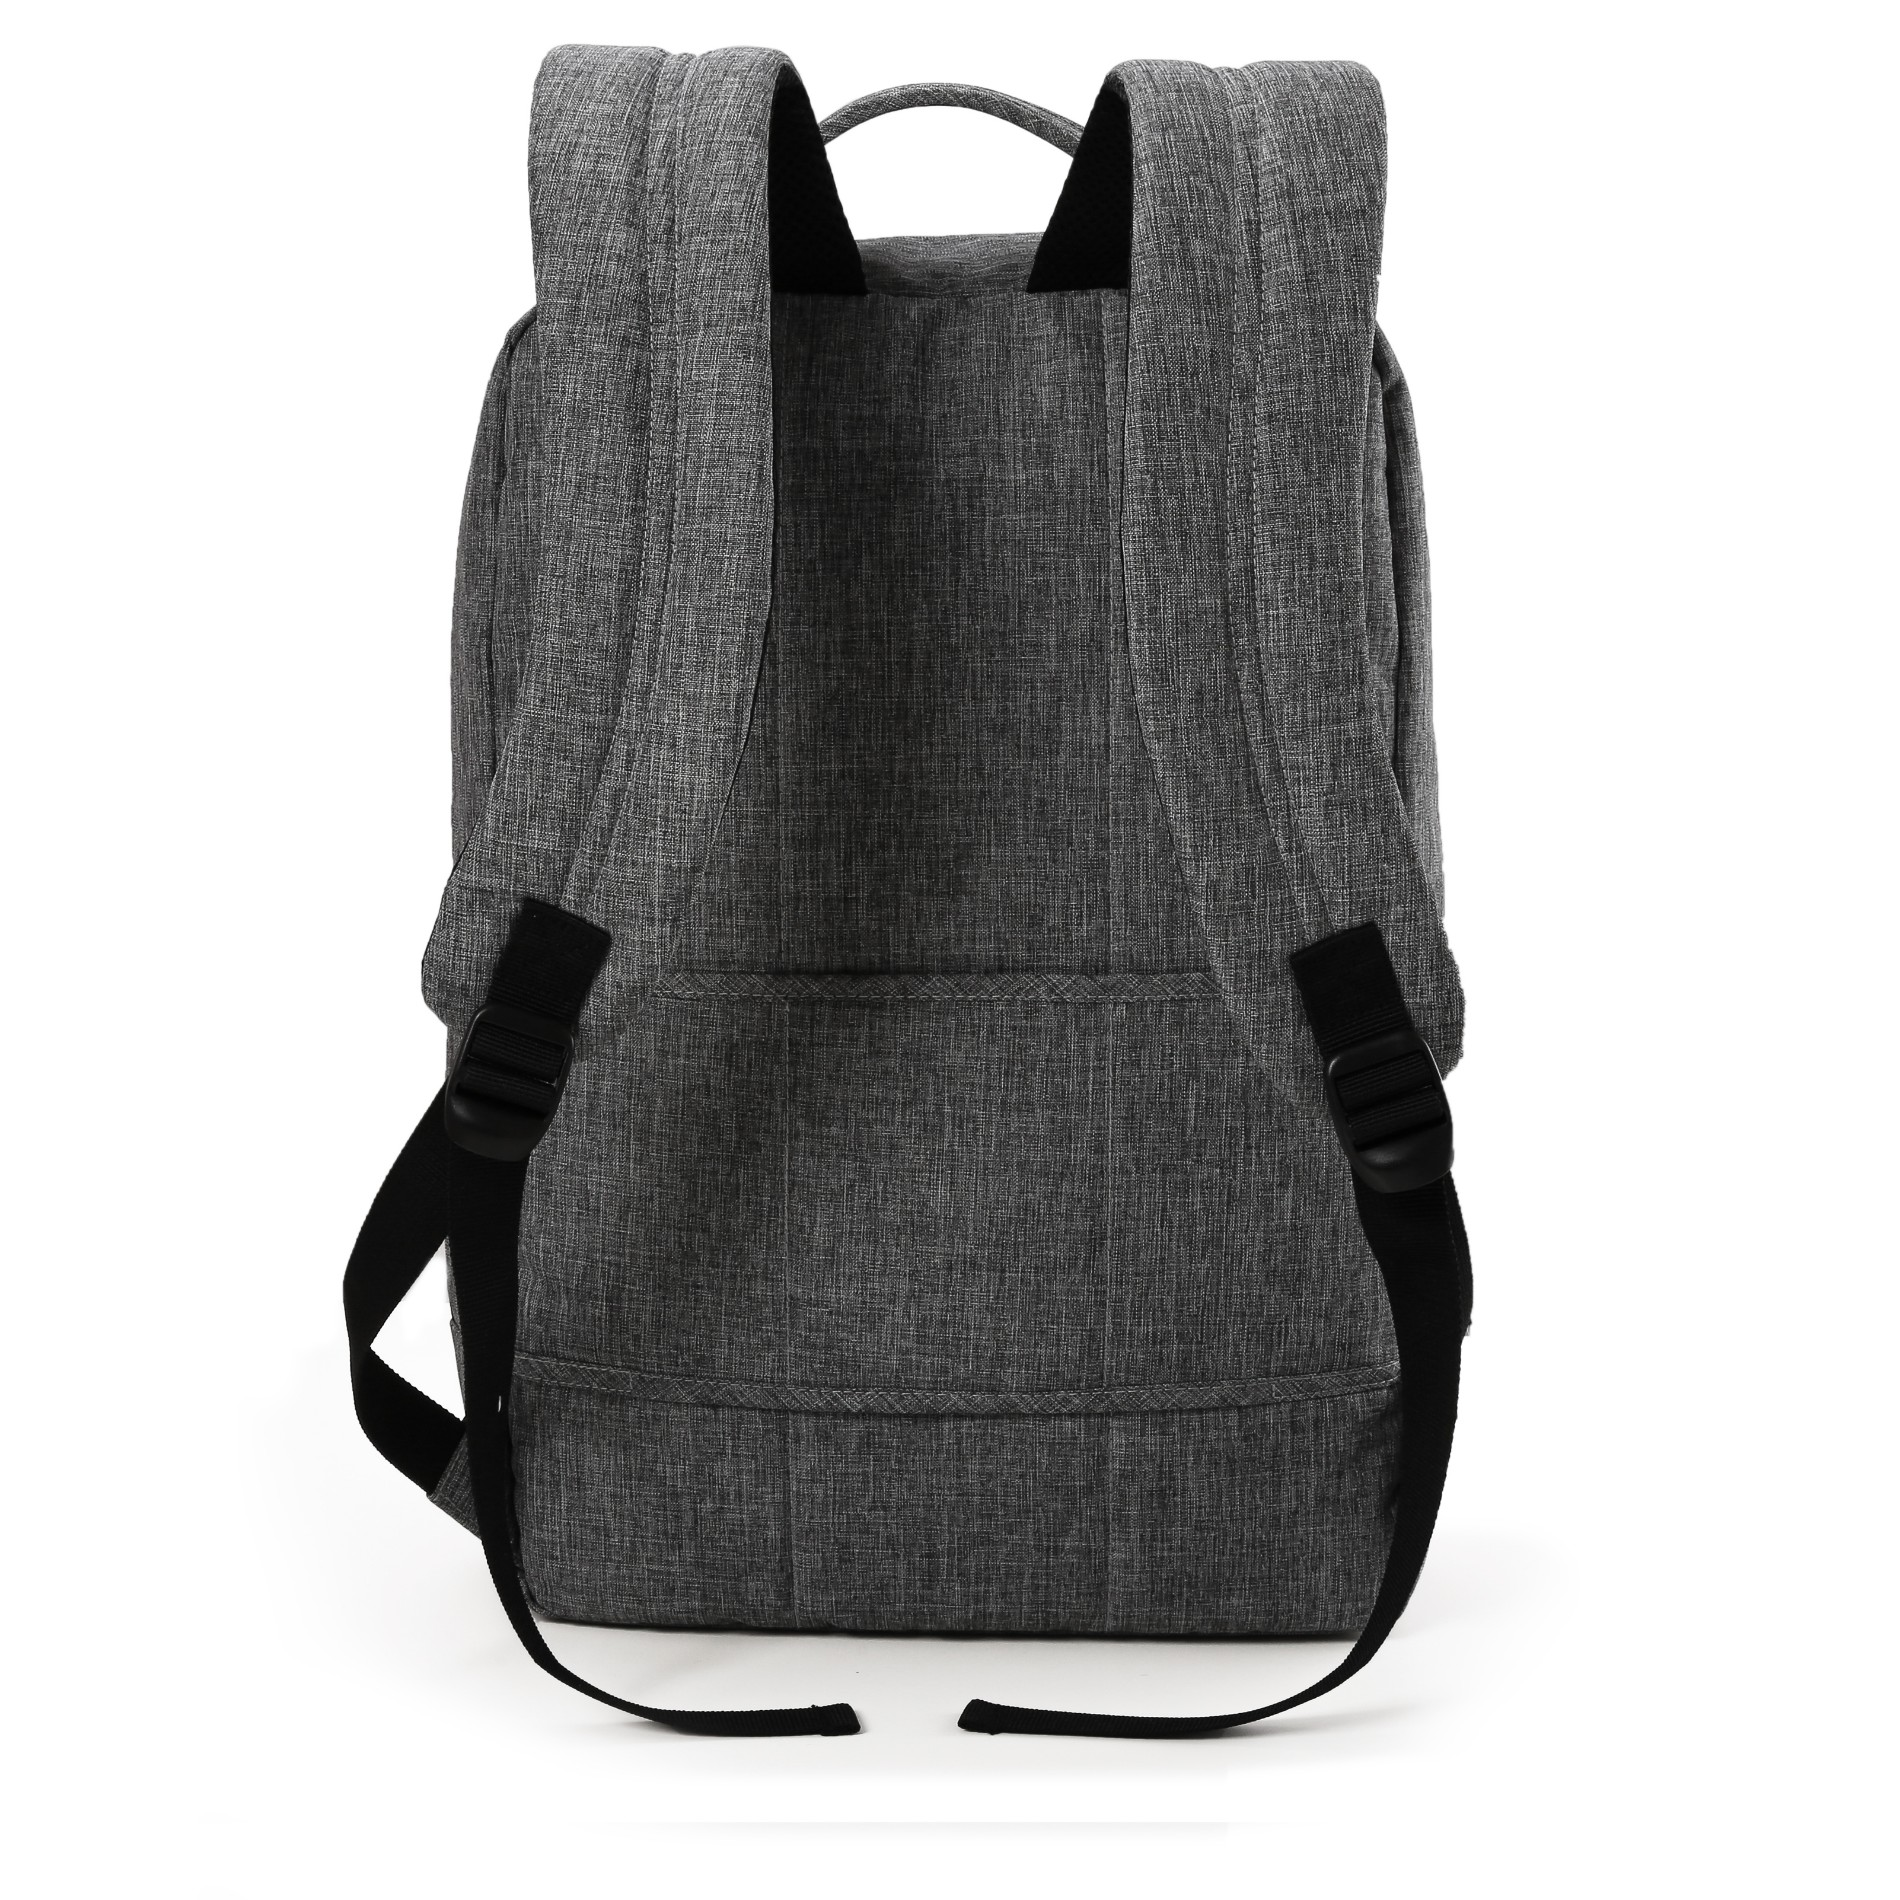 Laptop Backpack Bag Manufacturers, Laptop Backpack Bag Factory, Supply Laptop Backpack Bag